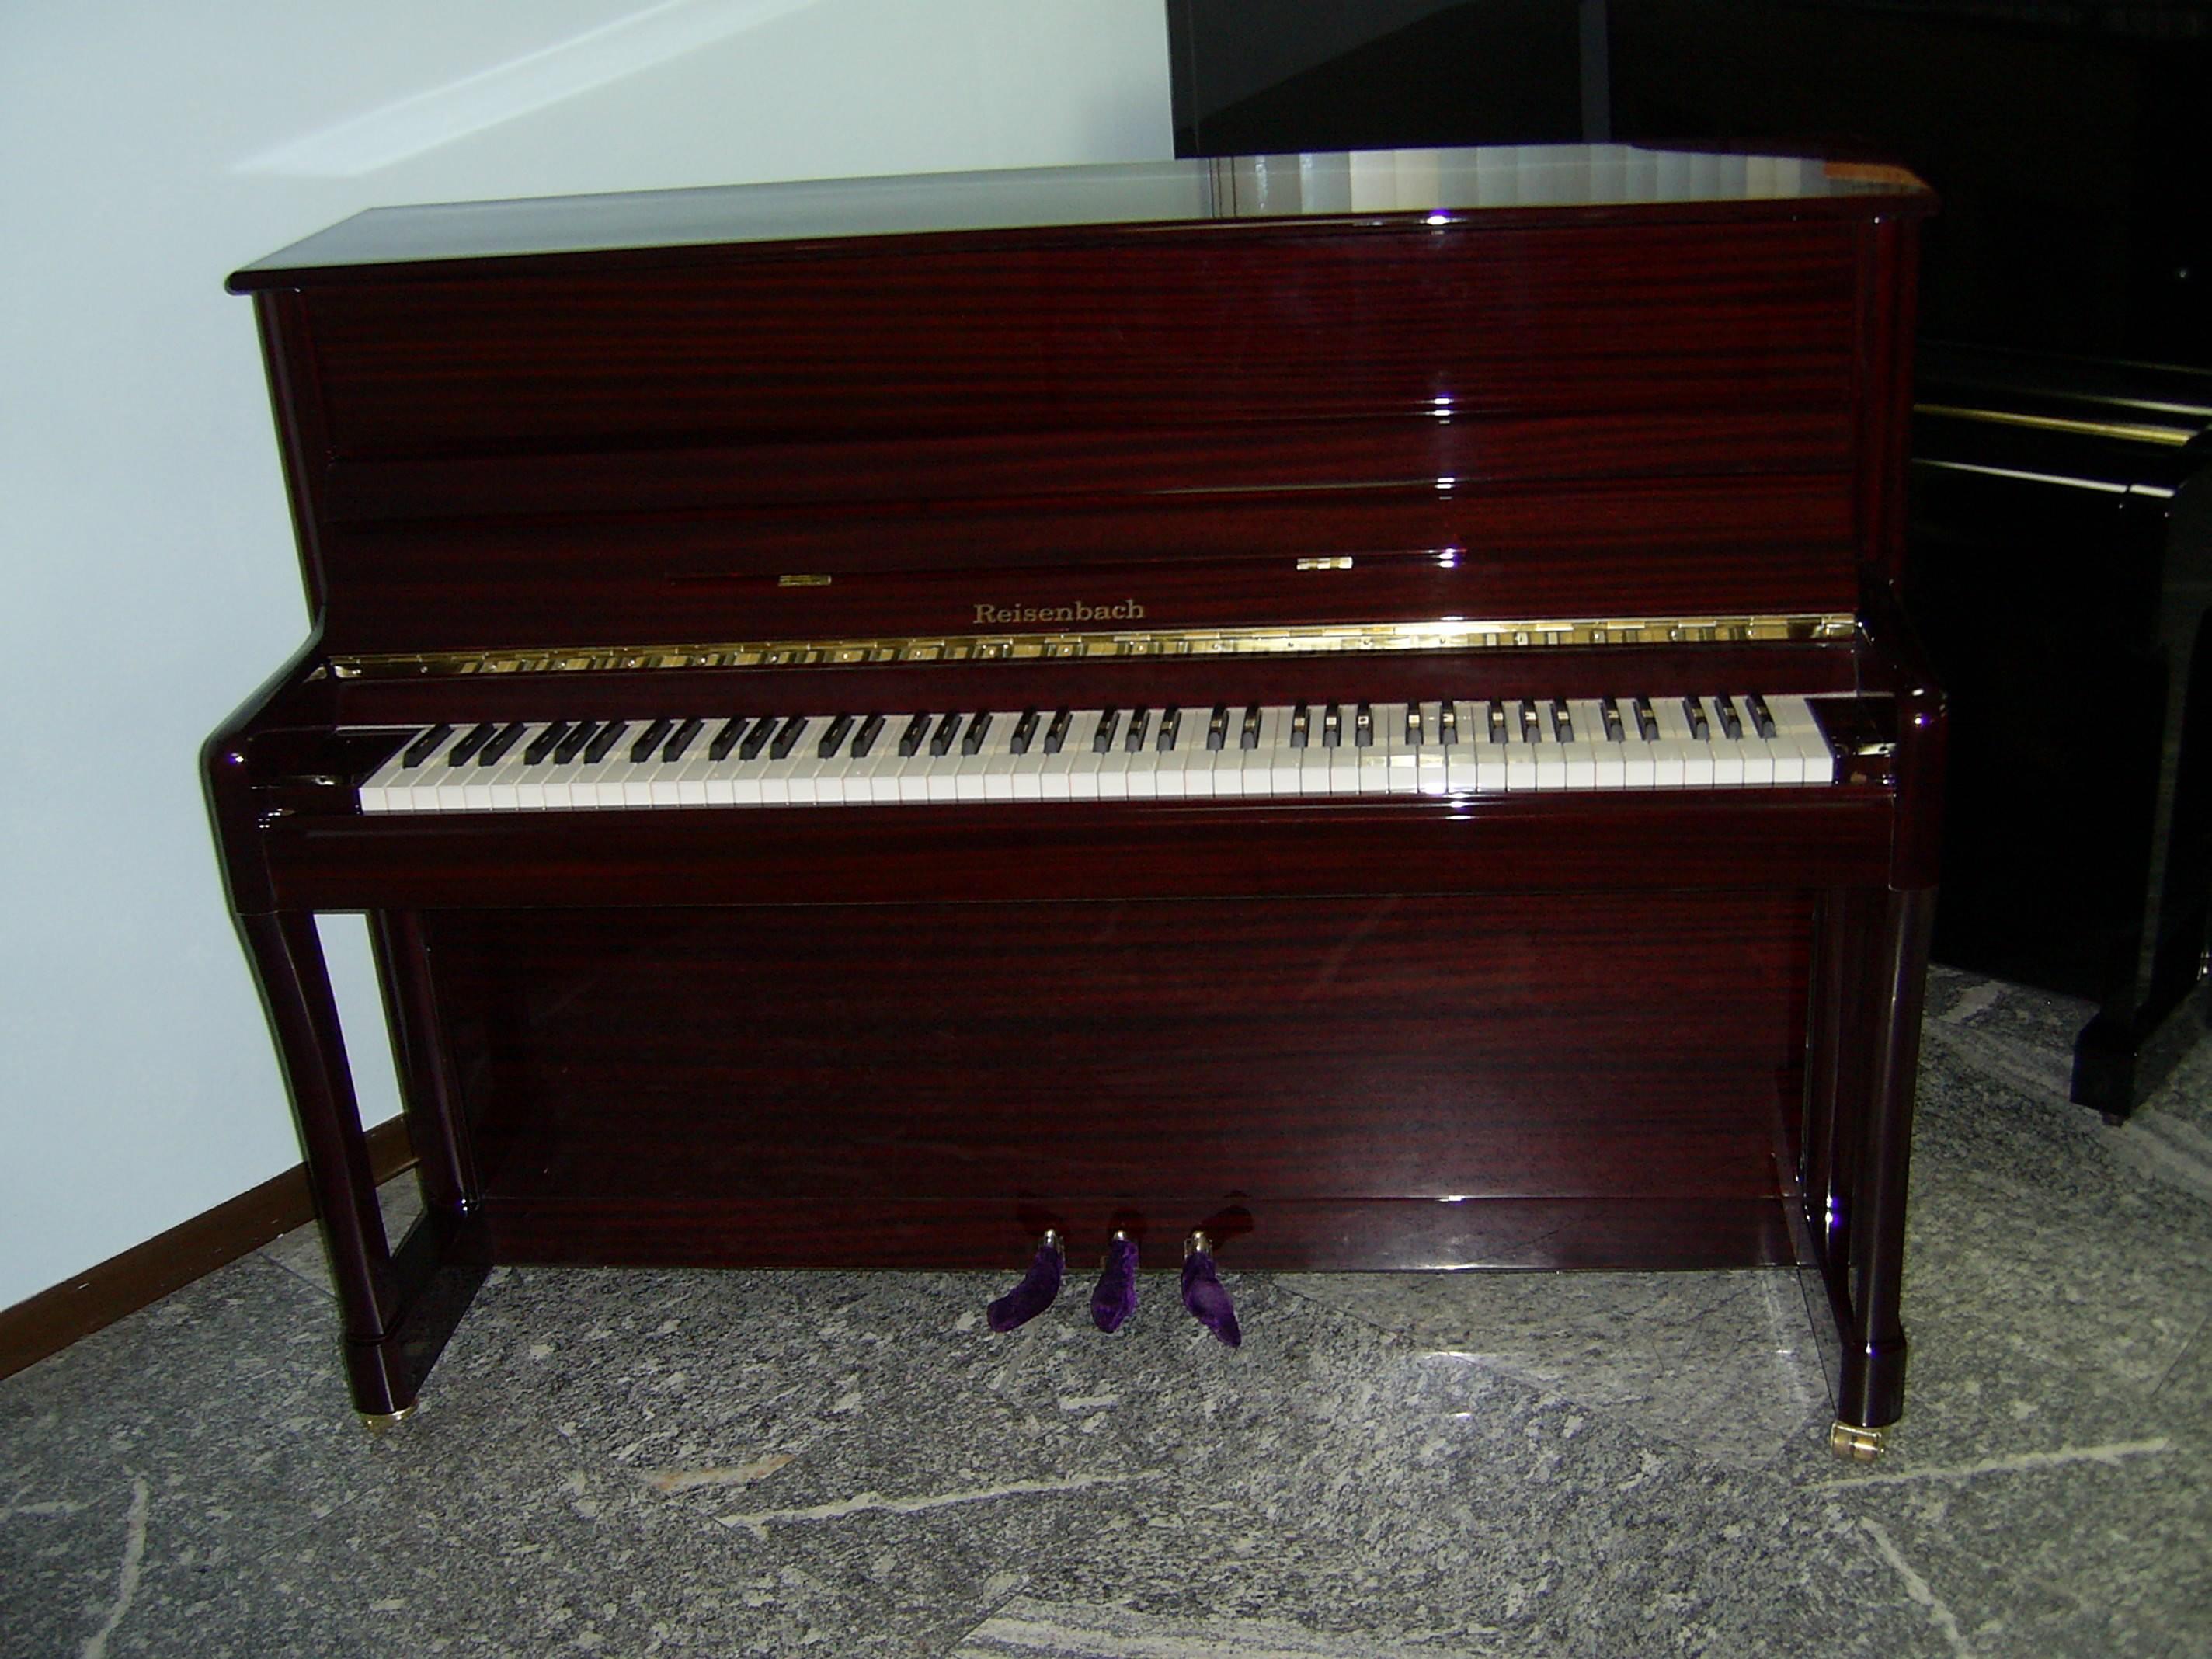 Saldi Brusegan - Brusegan Pianoforti, strumenti musicali, vendita ...